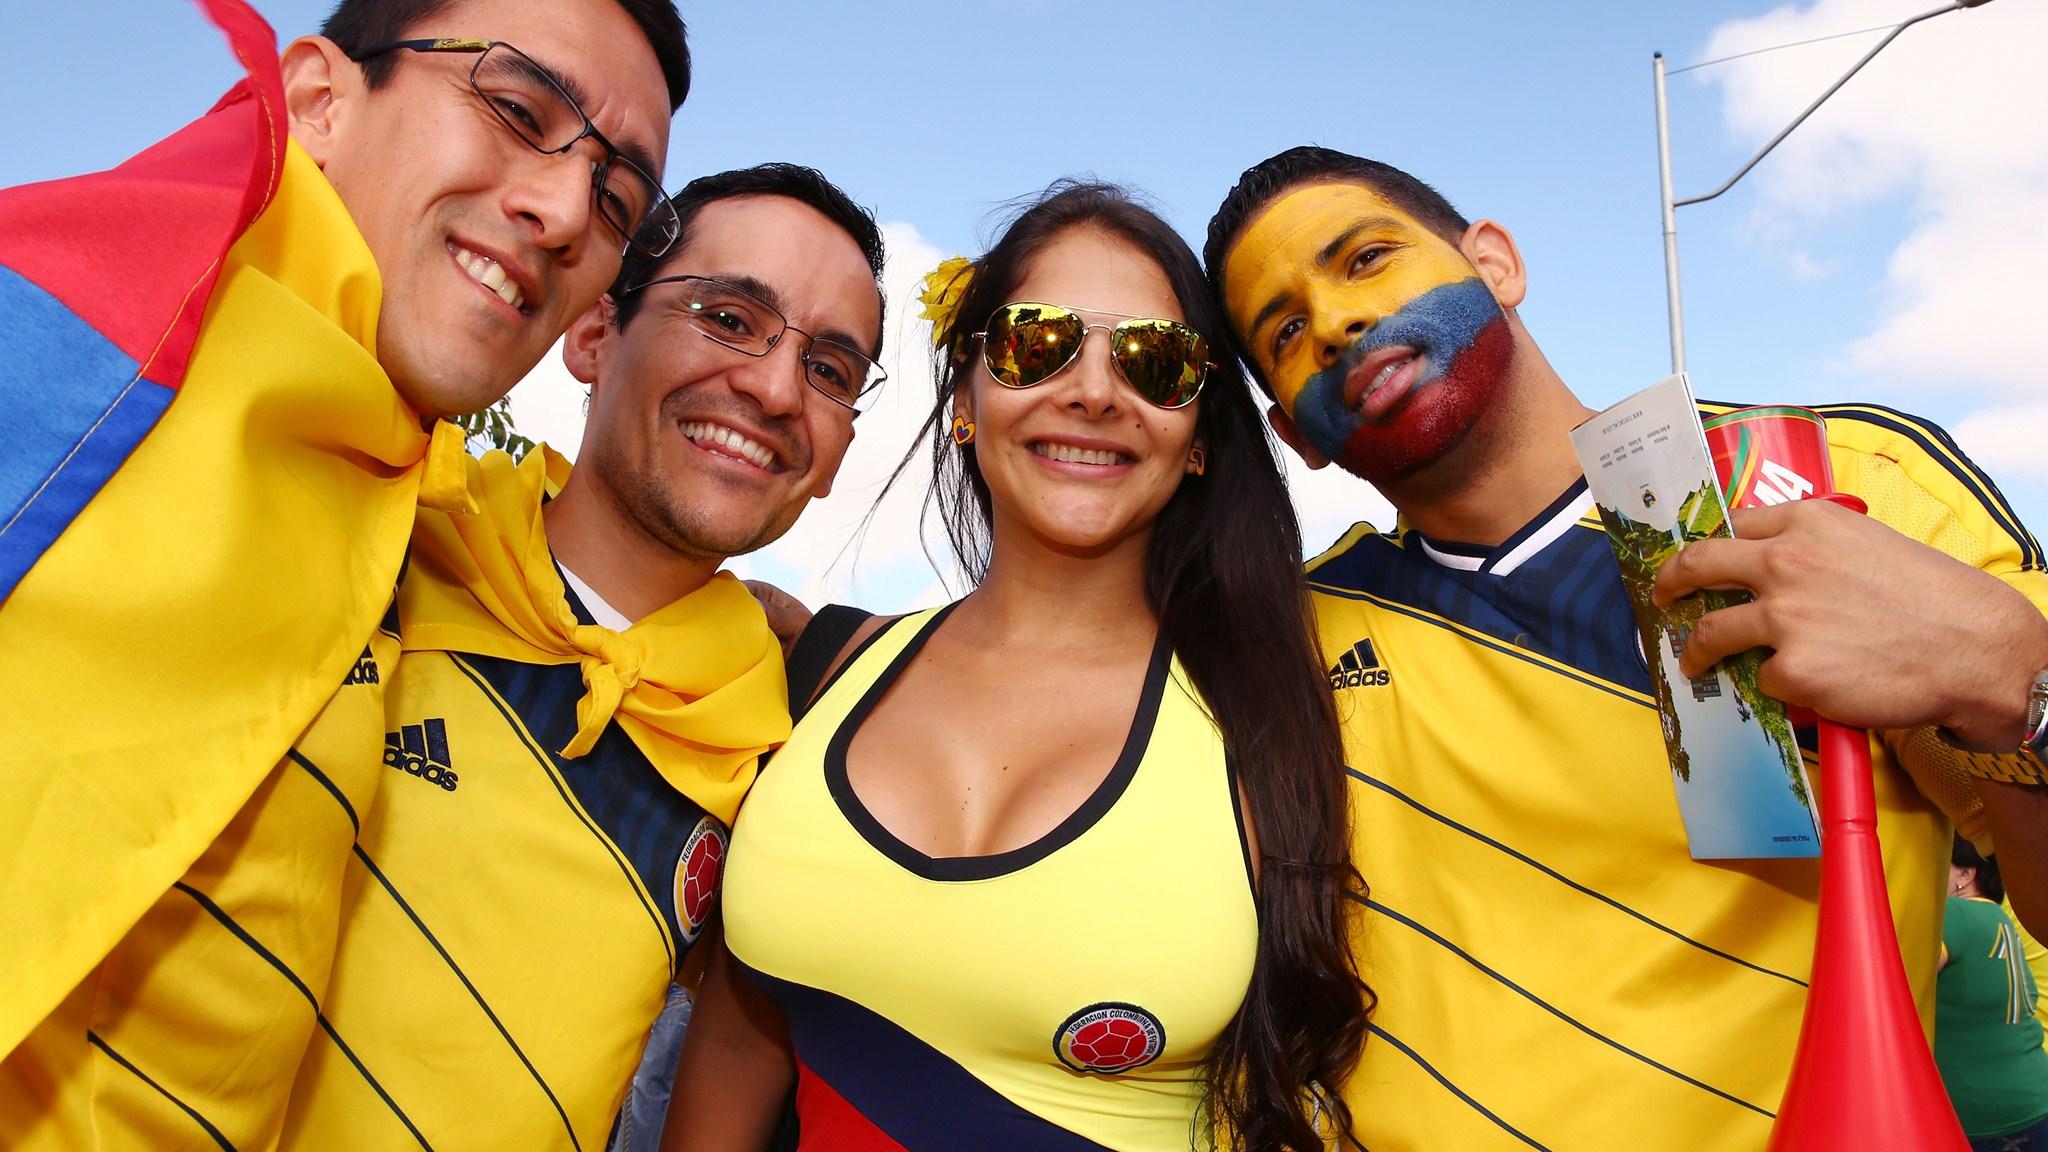 105 - Colombia-Greece [3-0] -- 14 Jun 2014 - 13-00 -- Belo Horizonte - Estadio Mineirao - kuaza